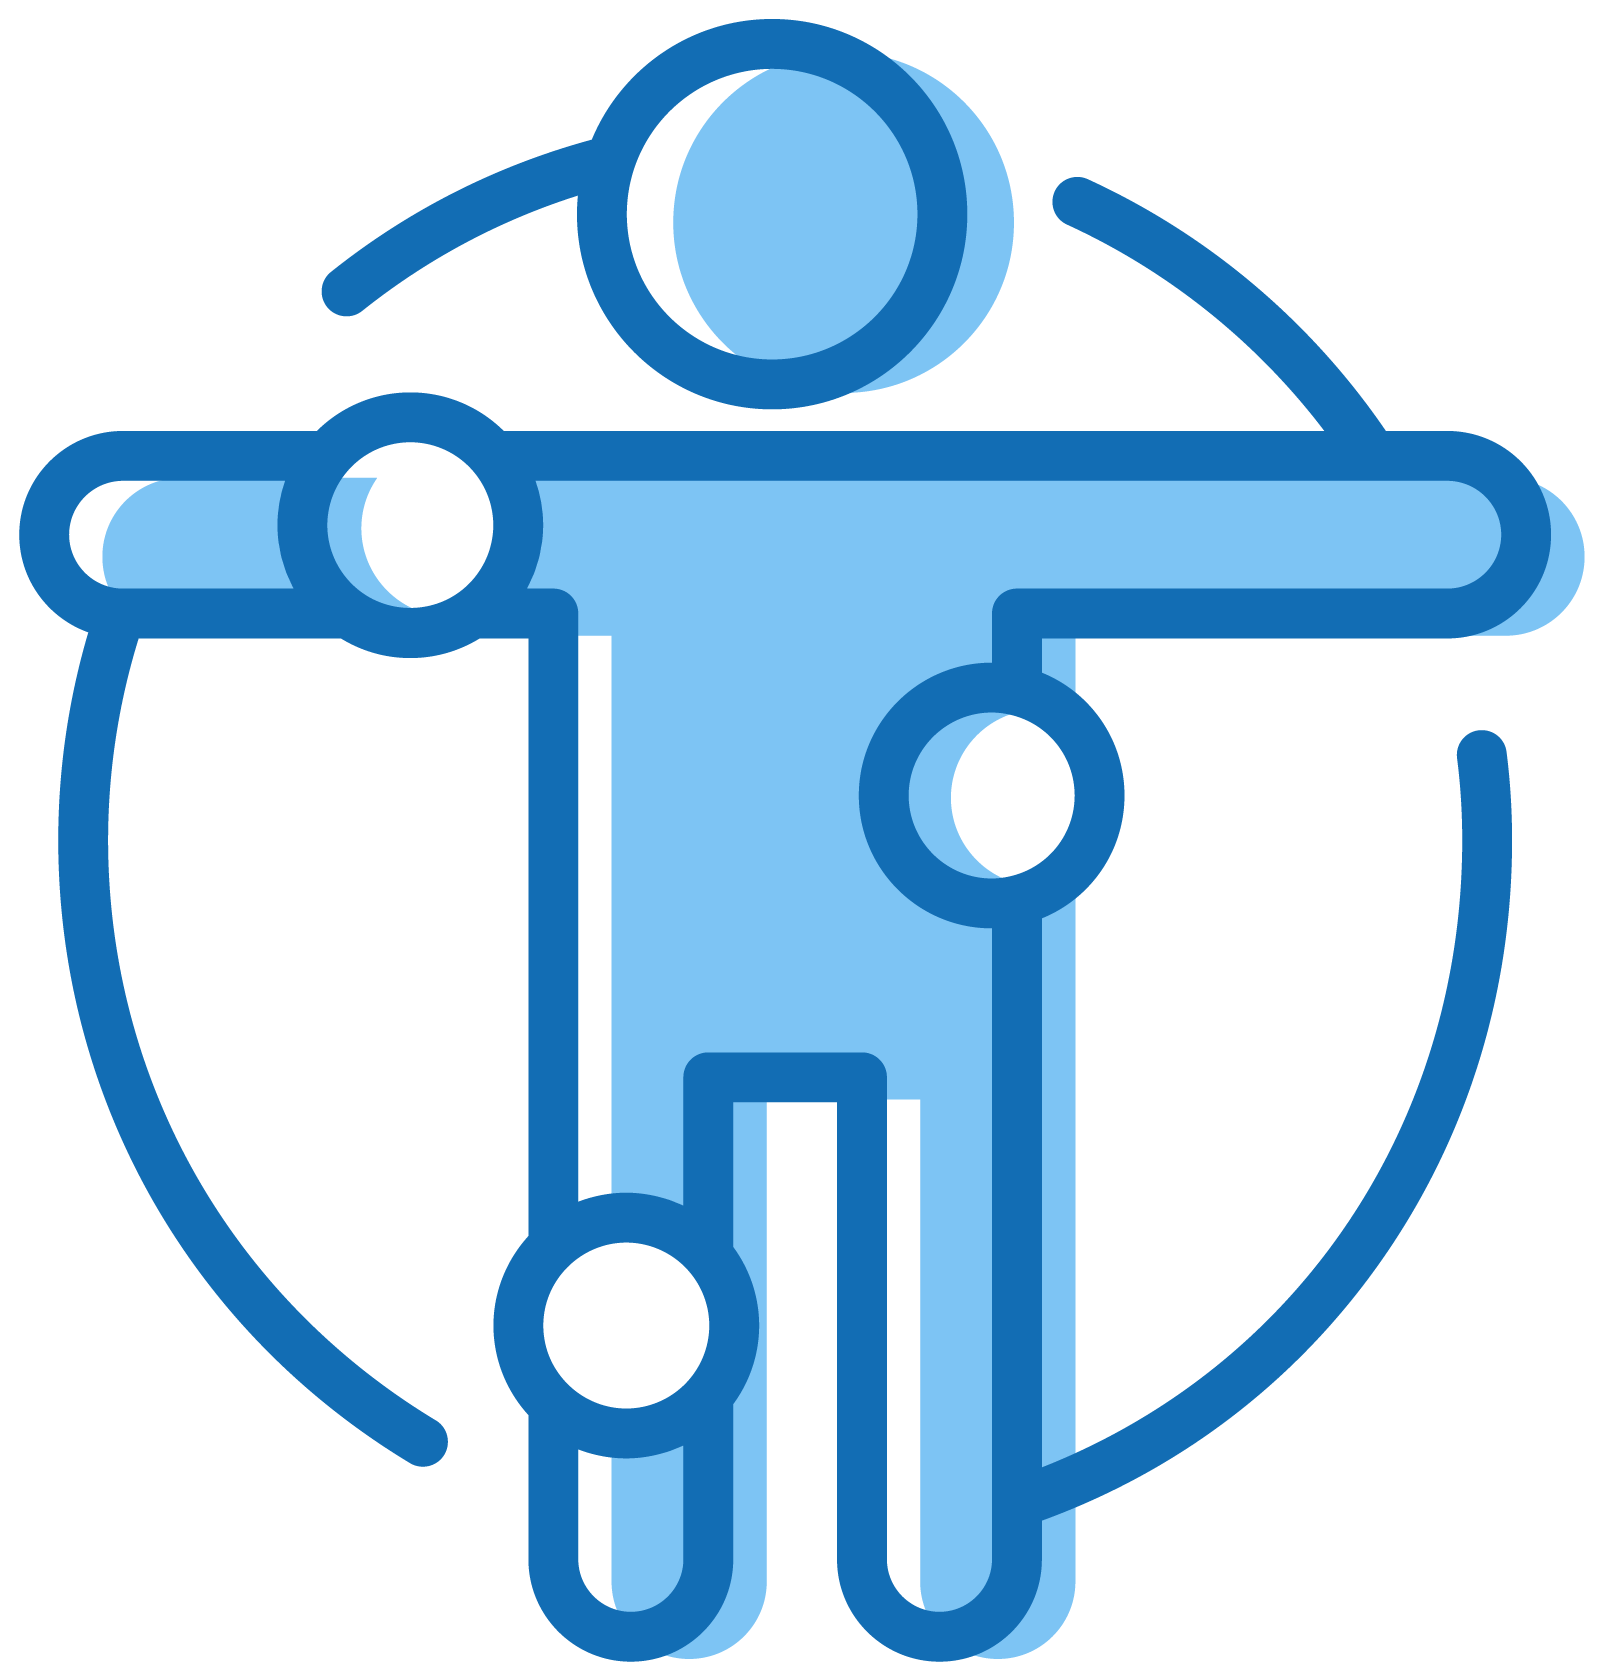 blue silhouette icon